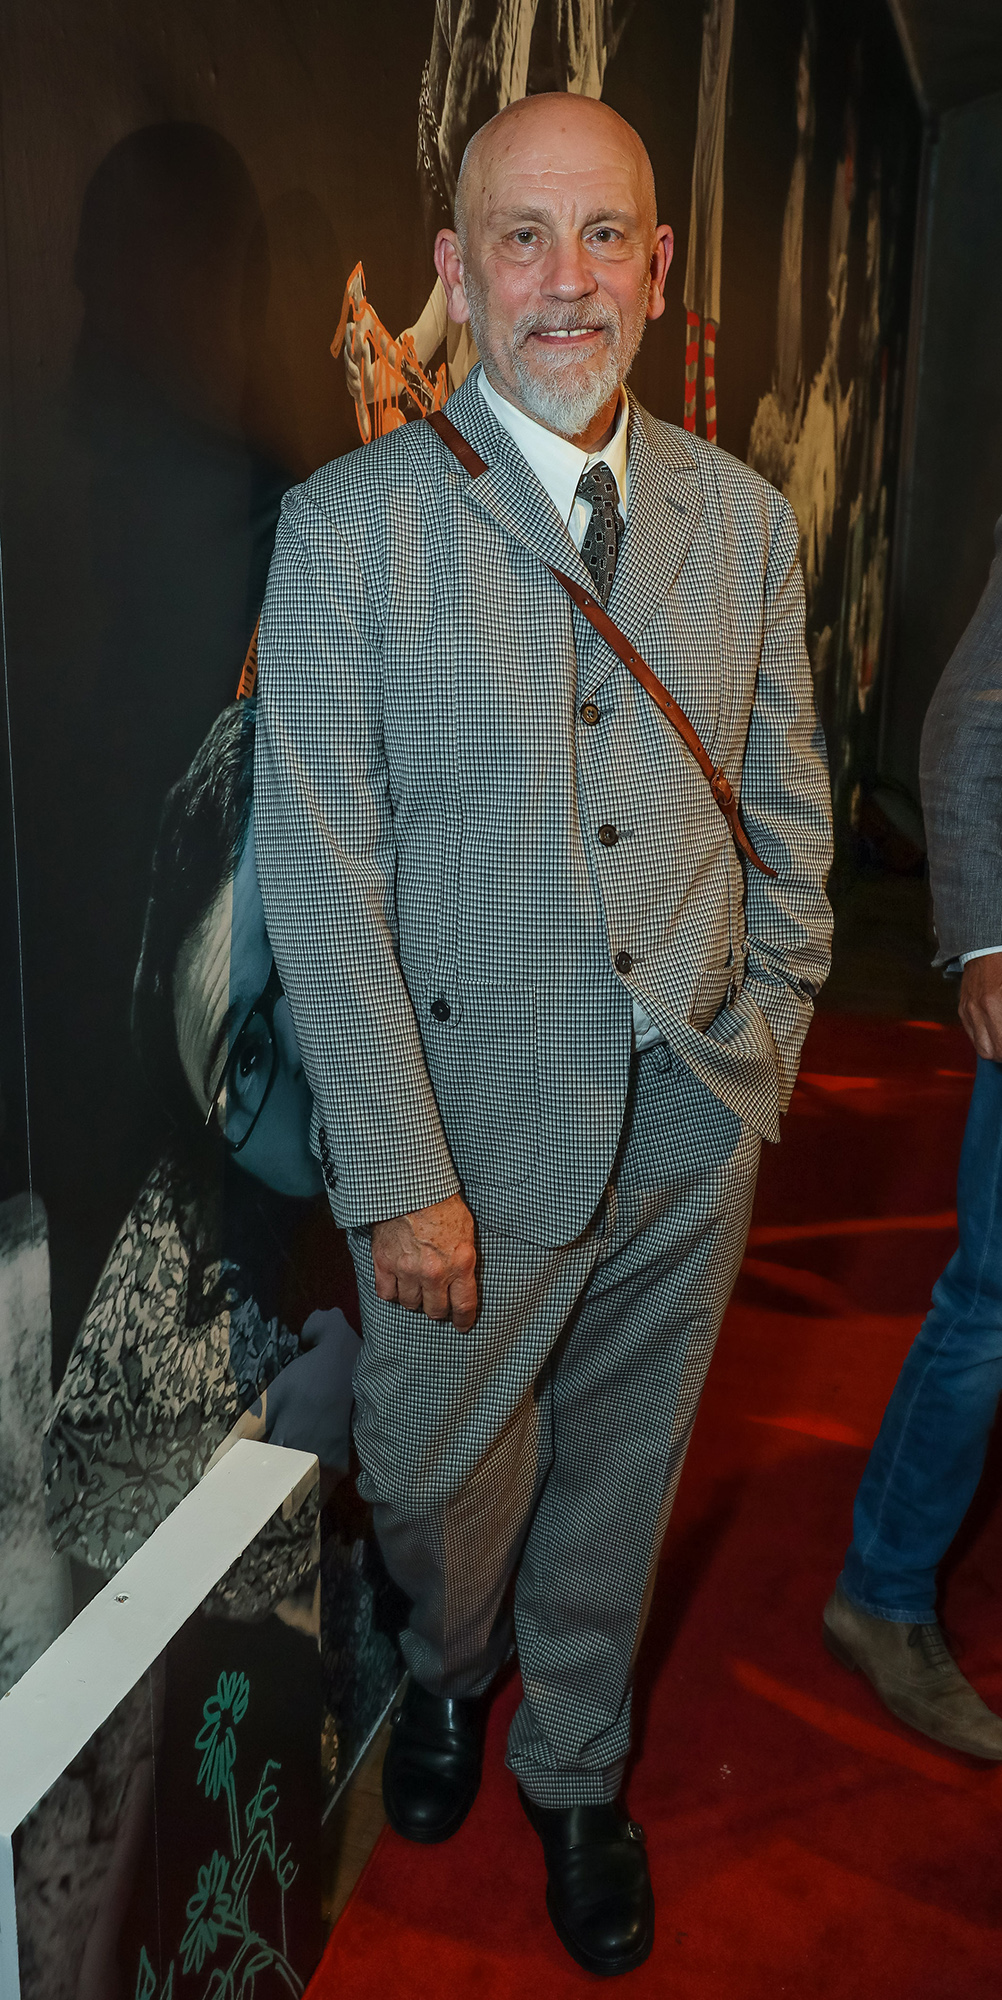 LONDON, ENGLAND - SEPTEMBER 21: John Malkovich attends the press night performance of